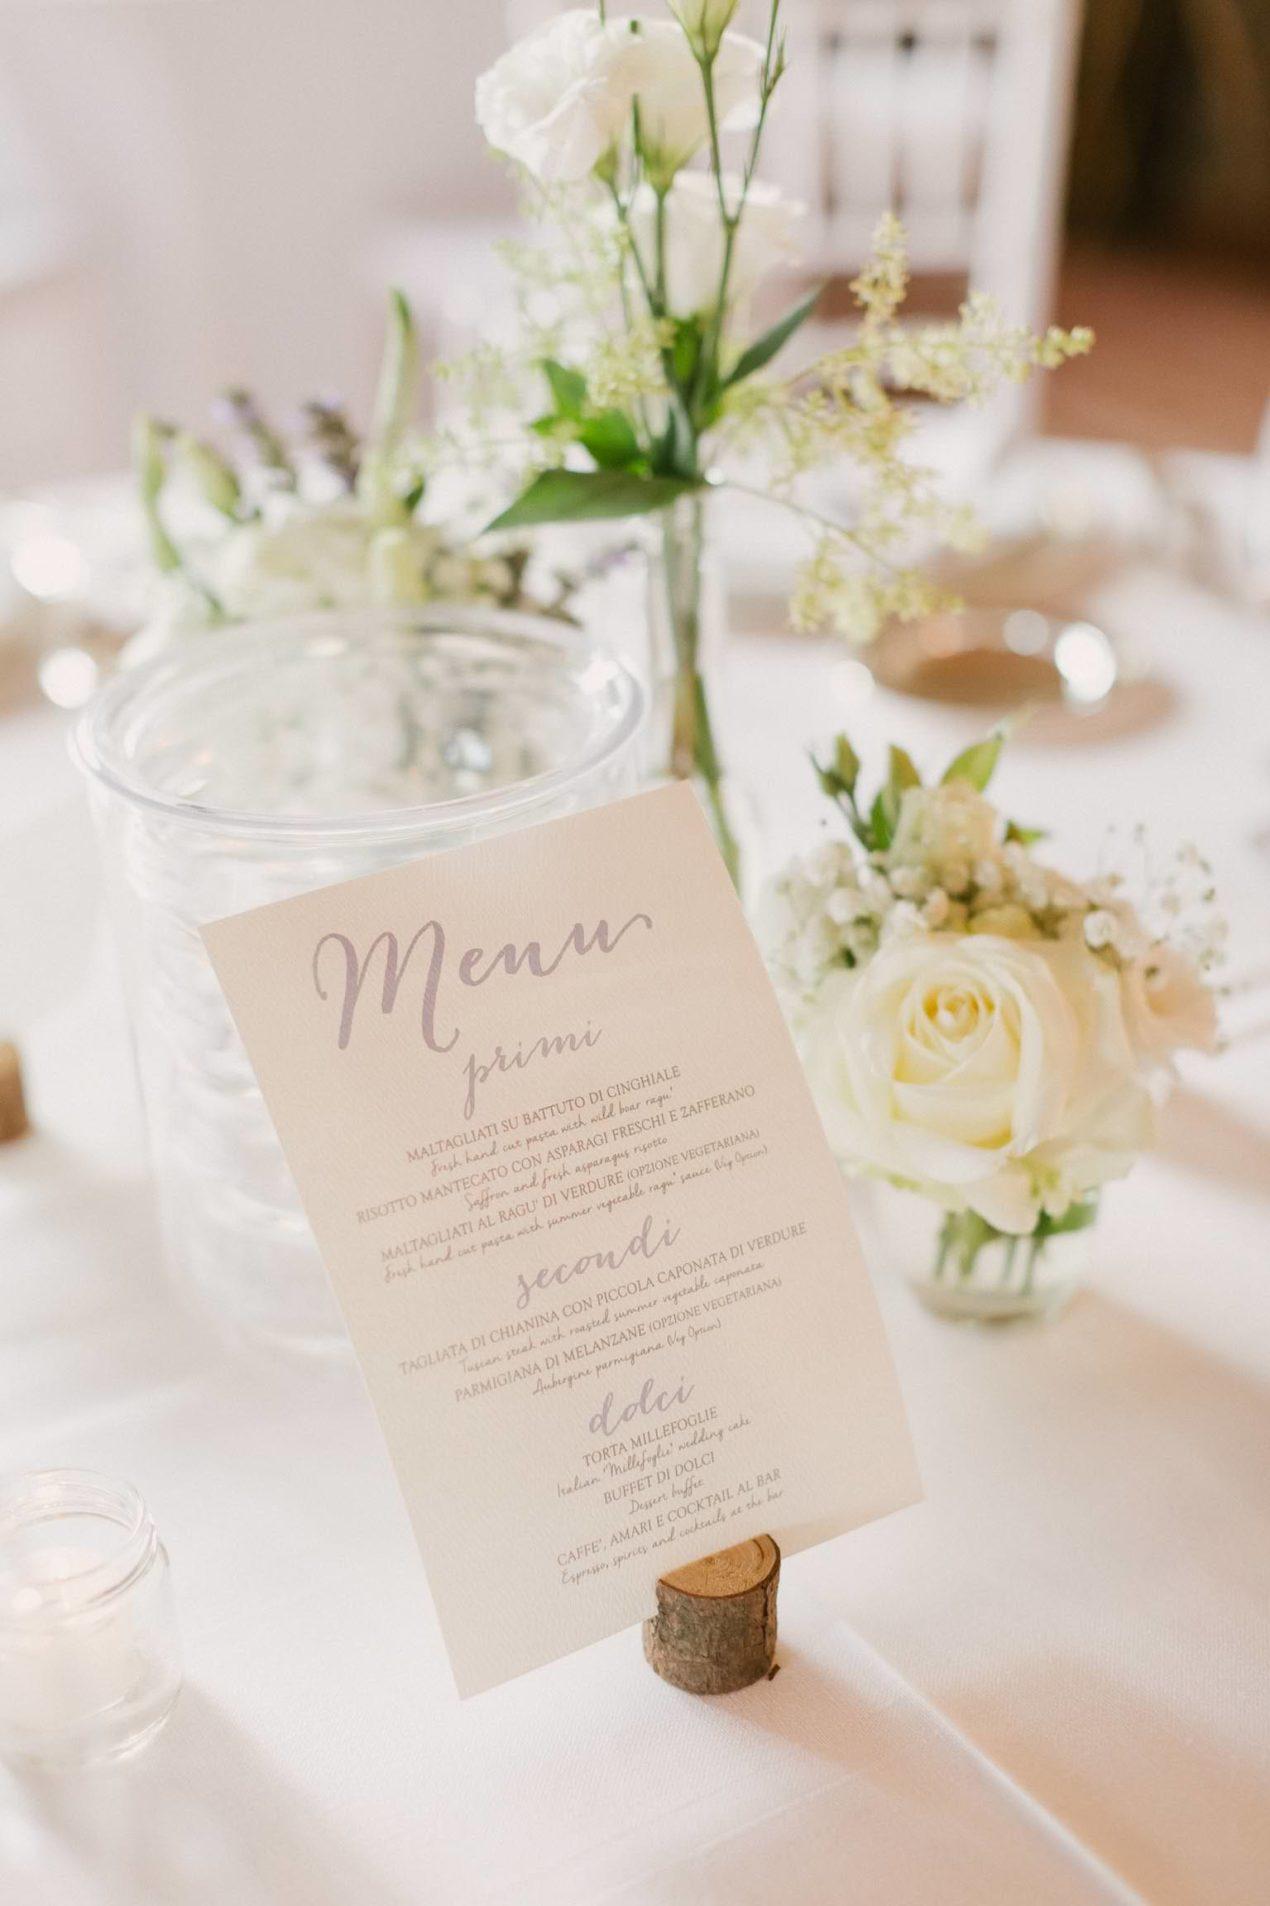 matrimonio-pienza-061-635x953@2x.jpg